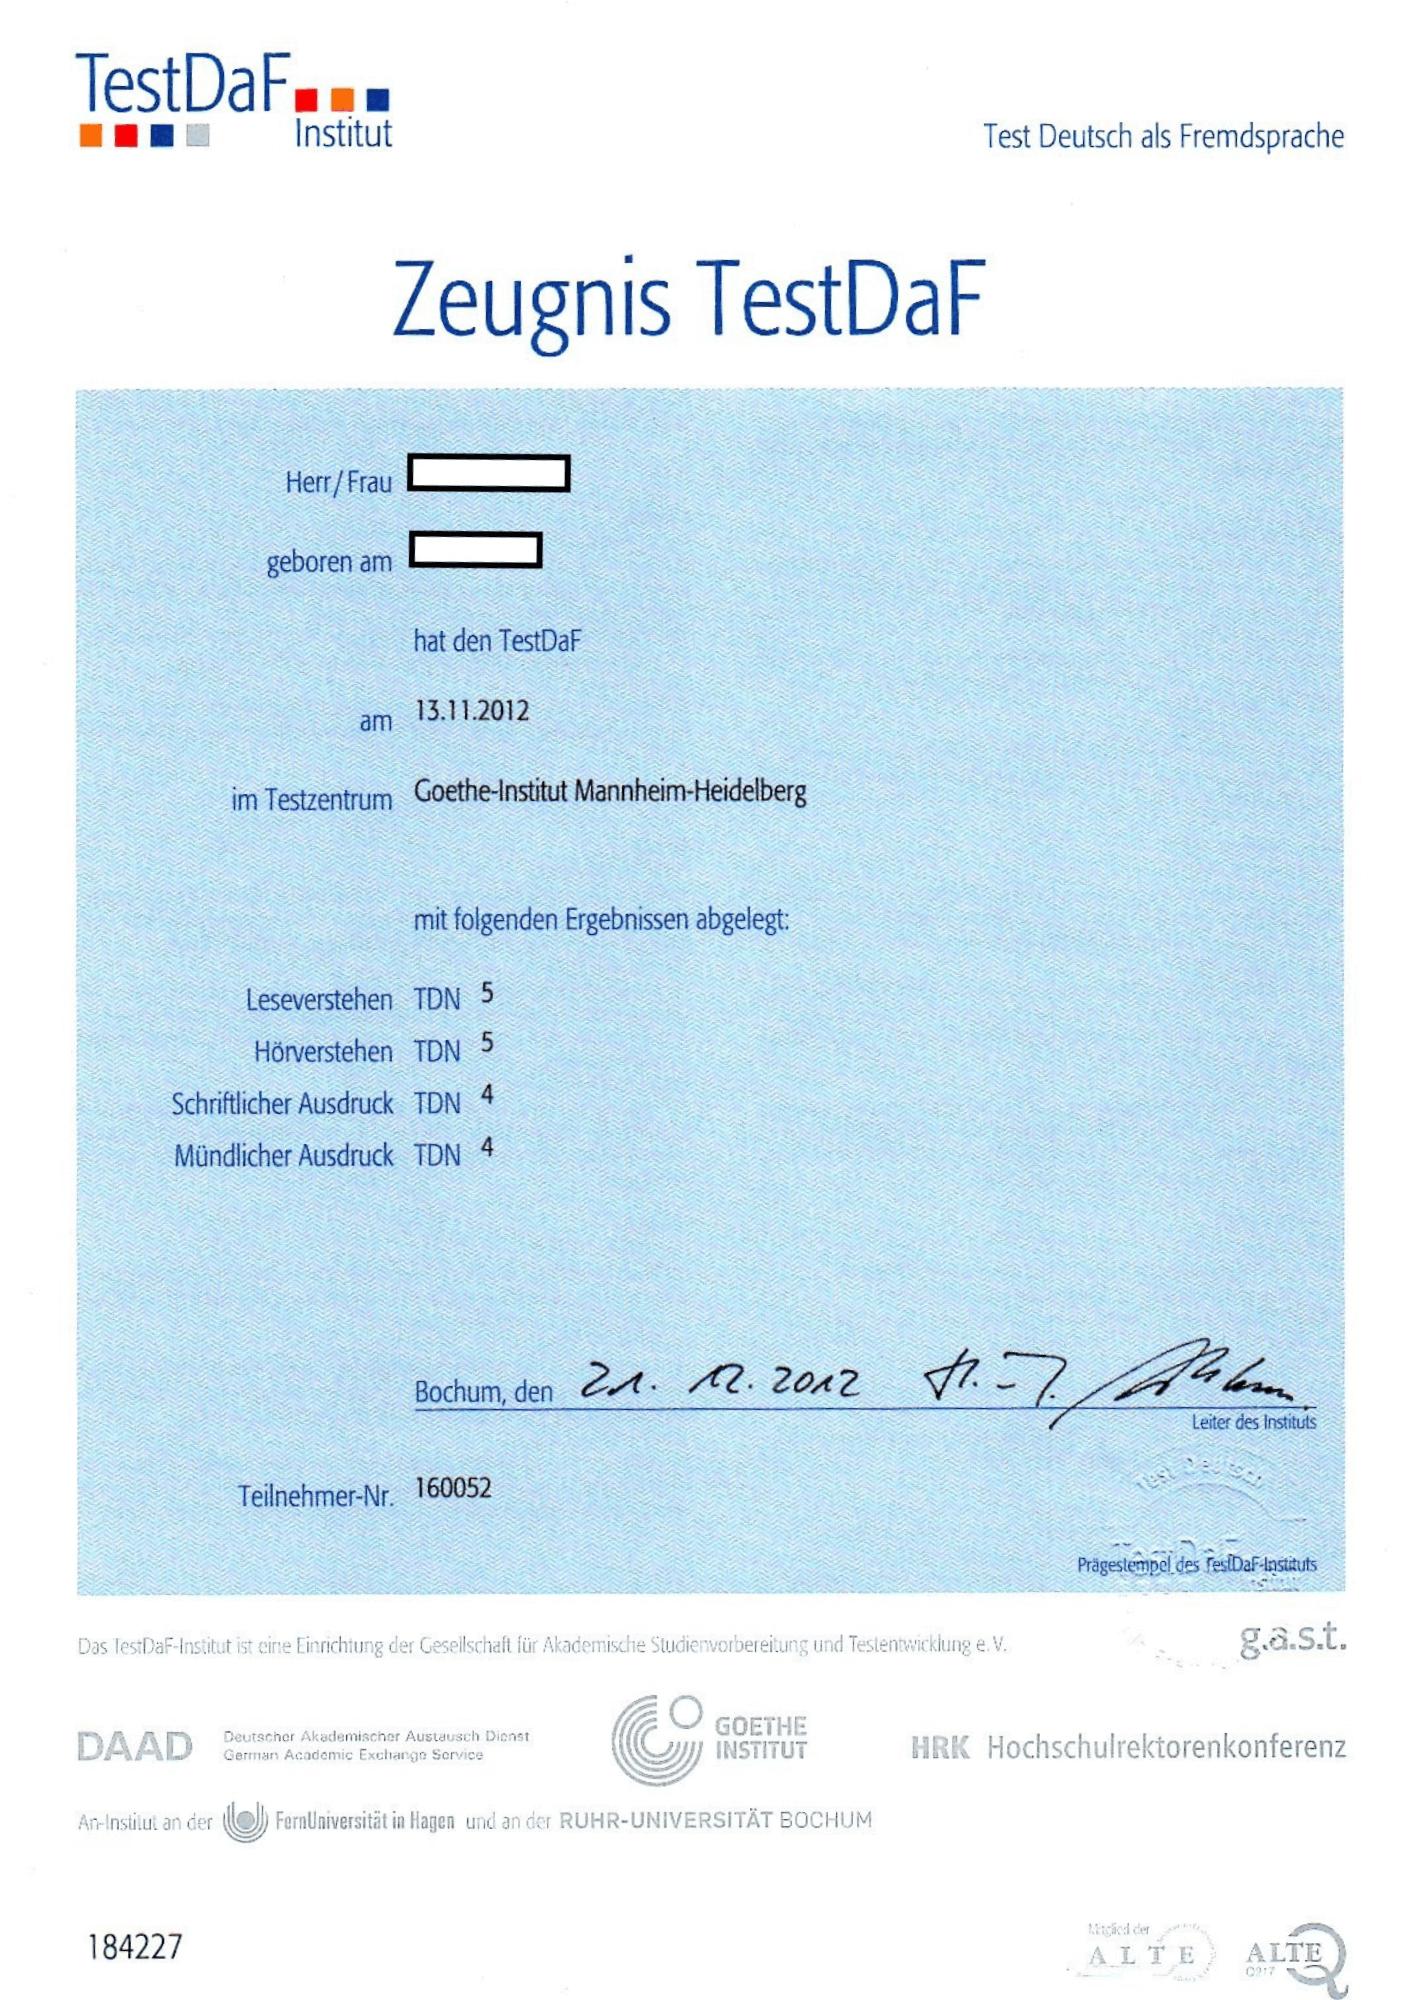 德福 TestDaF 證書